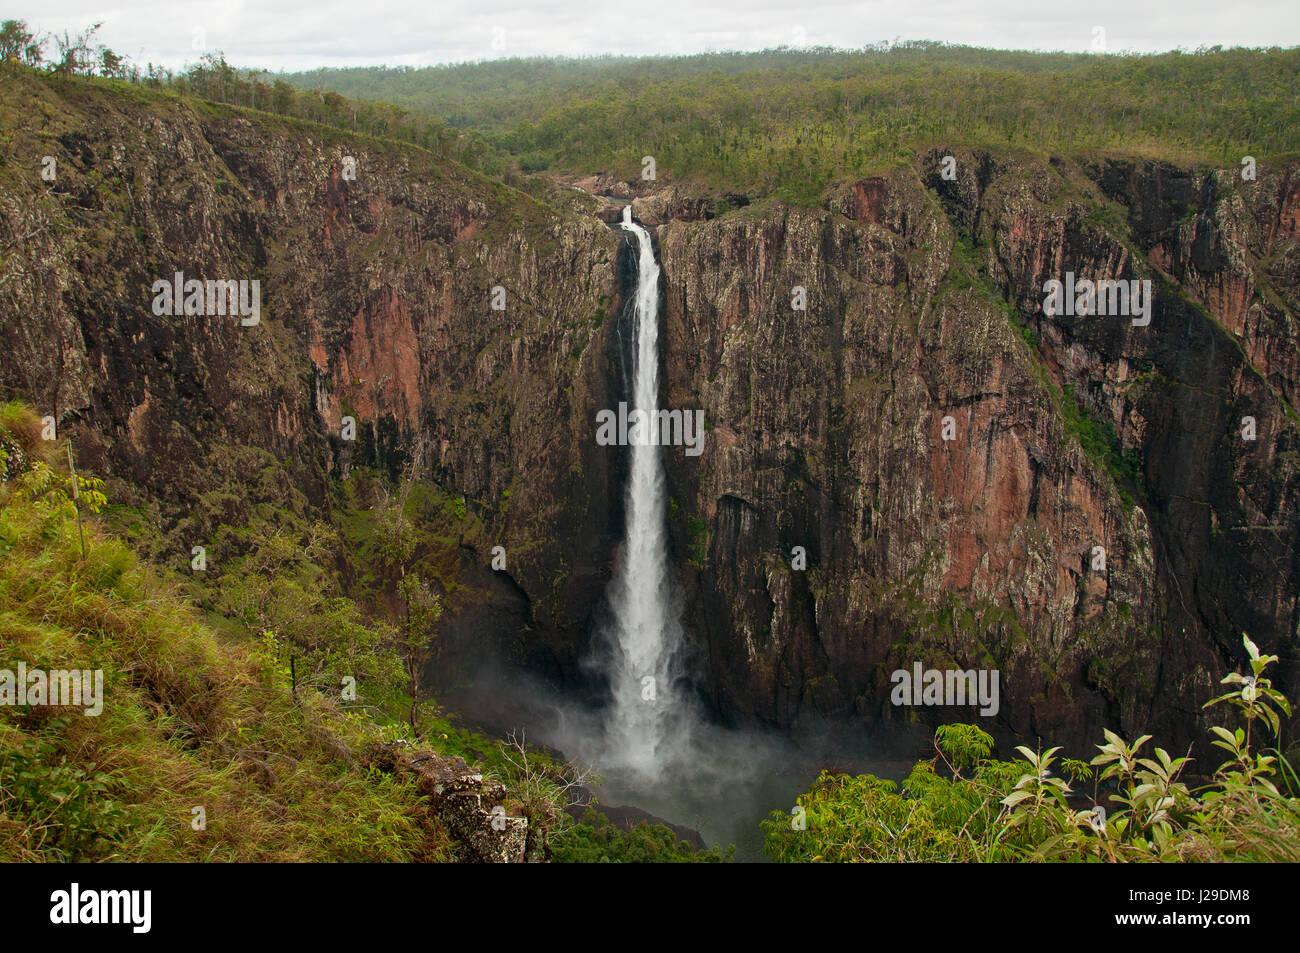 Waterfall- Wallman Falls 268 meters high in Australia - Stock Image